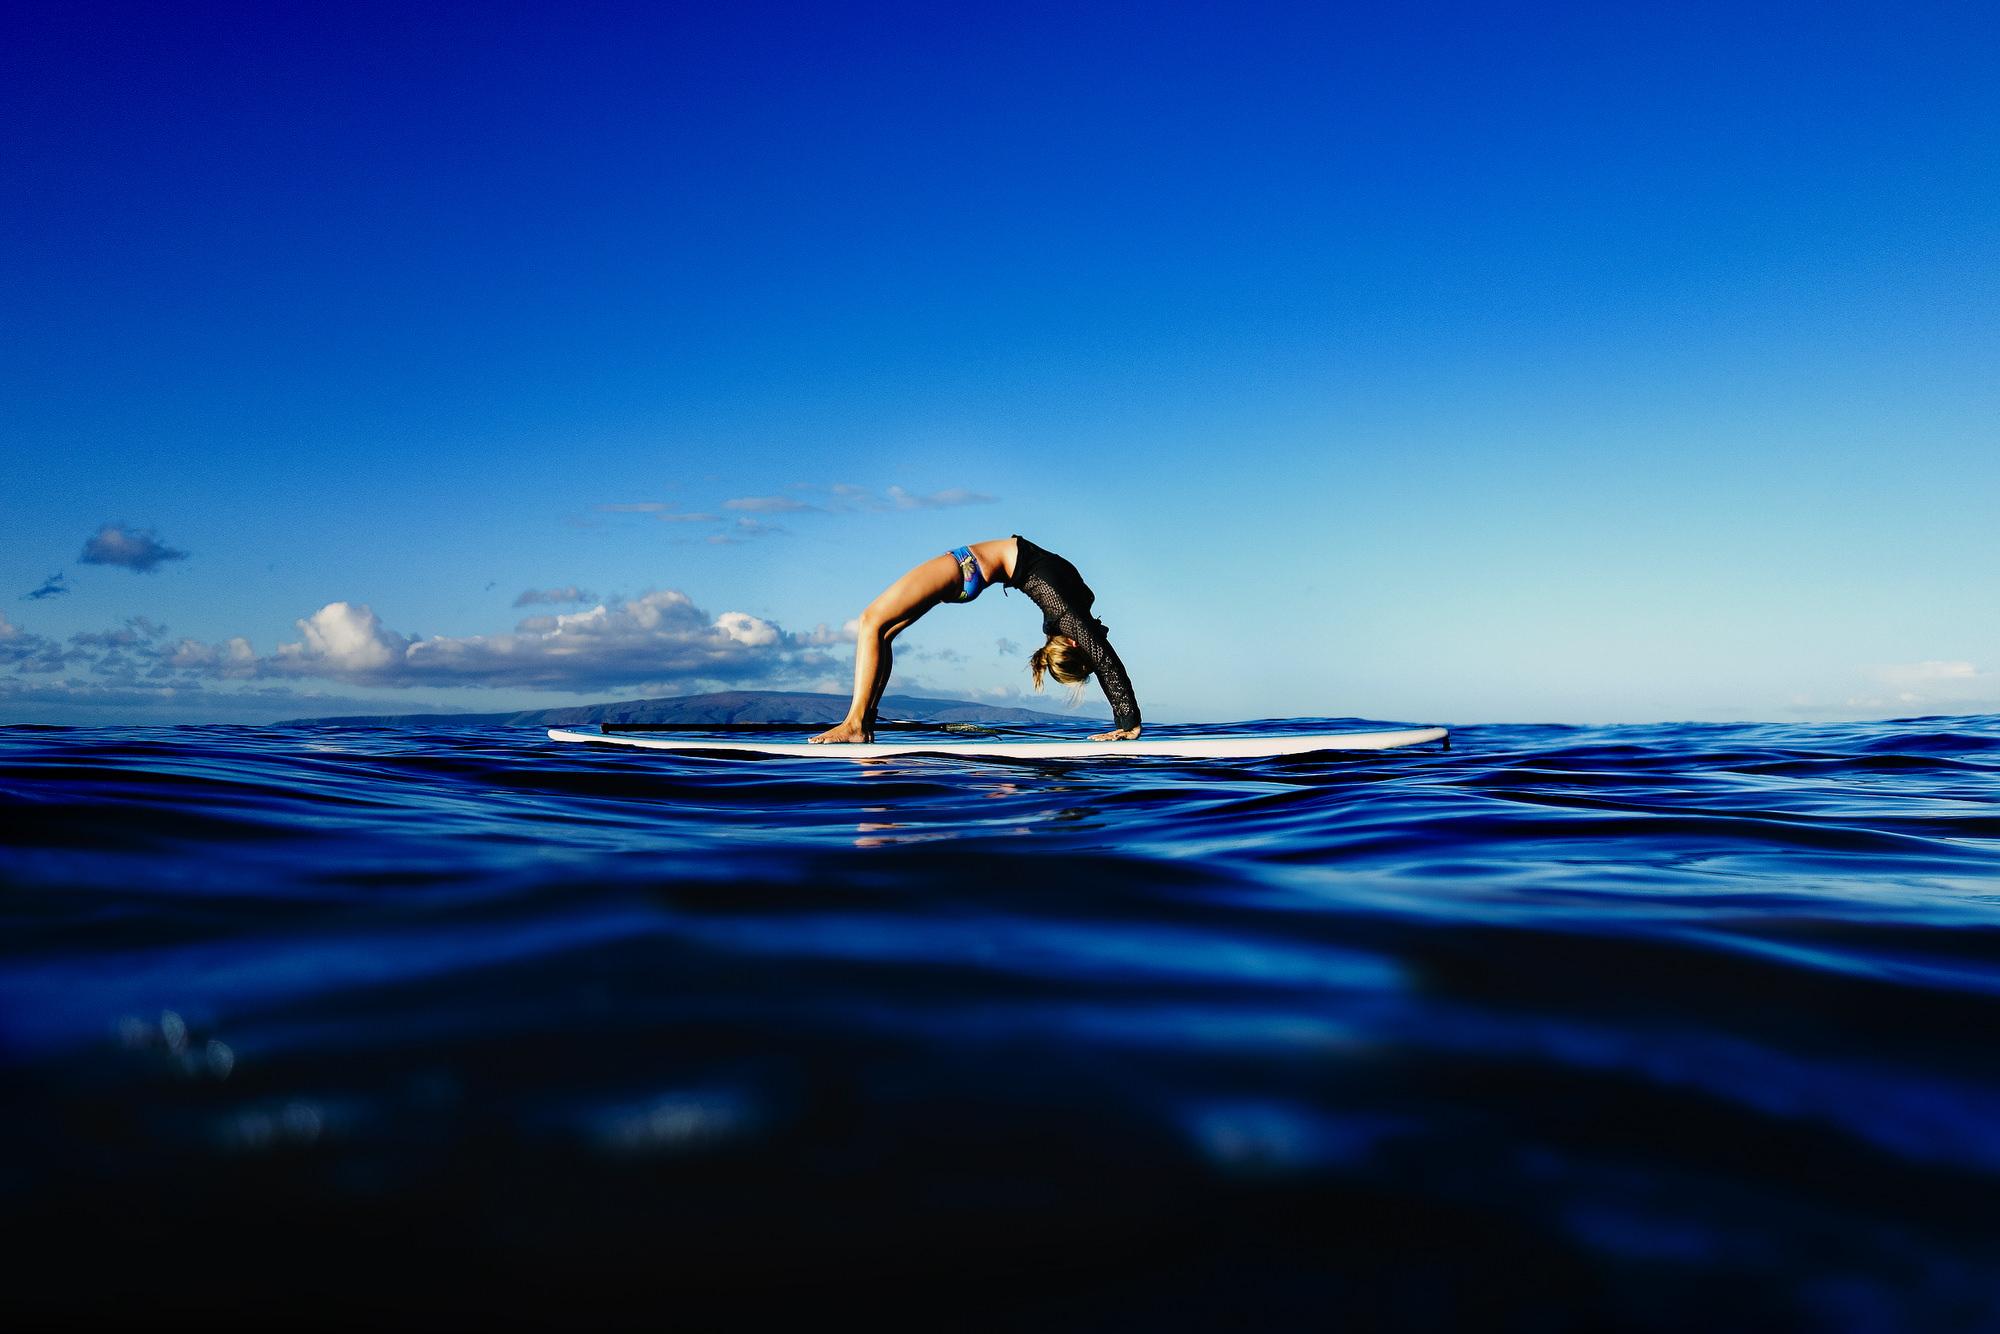 Four Seasons Resort Maui, Wailea, Hawaii. Stand Up Paddle Board Yoga branding portraits of Kathryn Budig by Stark Photography.